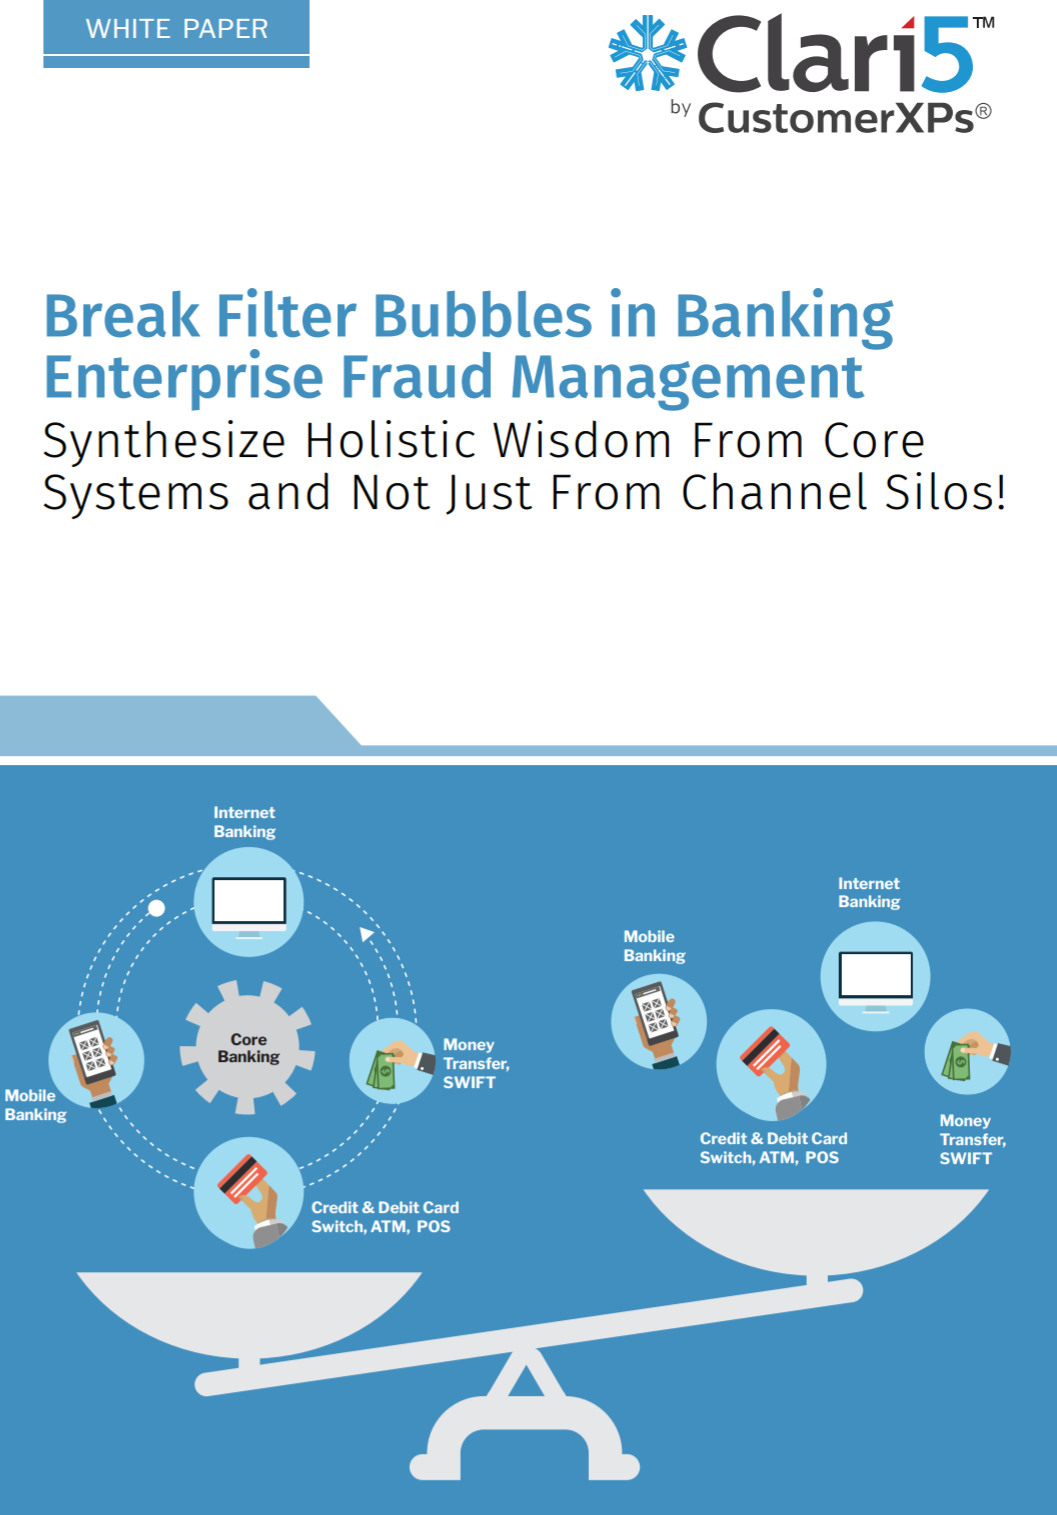 Break Filter Bubbles in Banking Enterprise Fraud Management